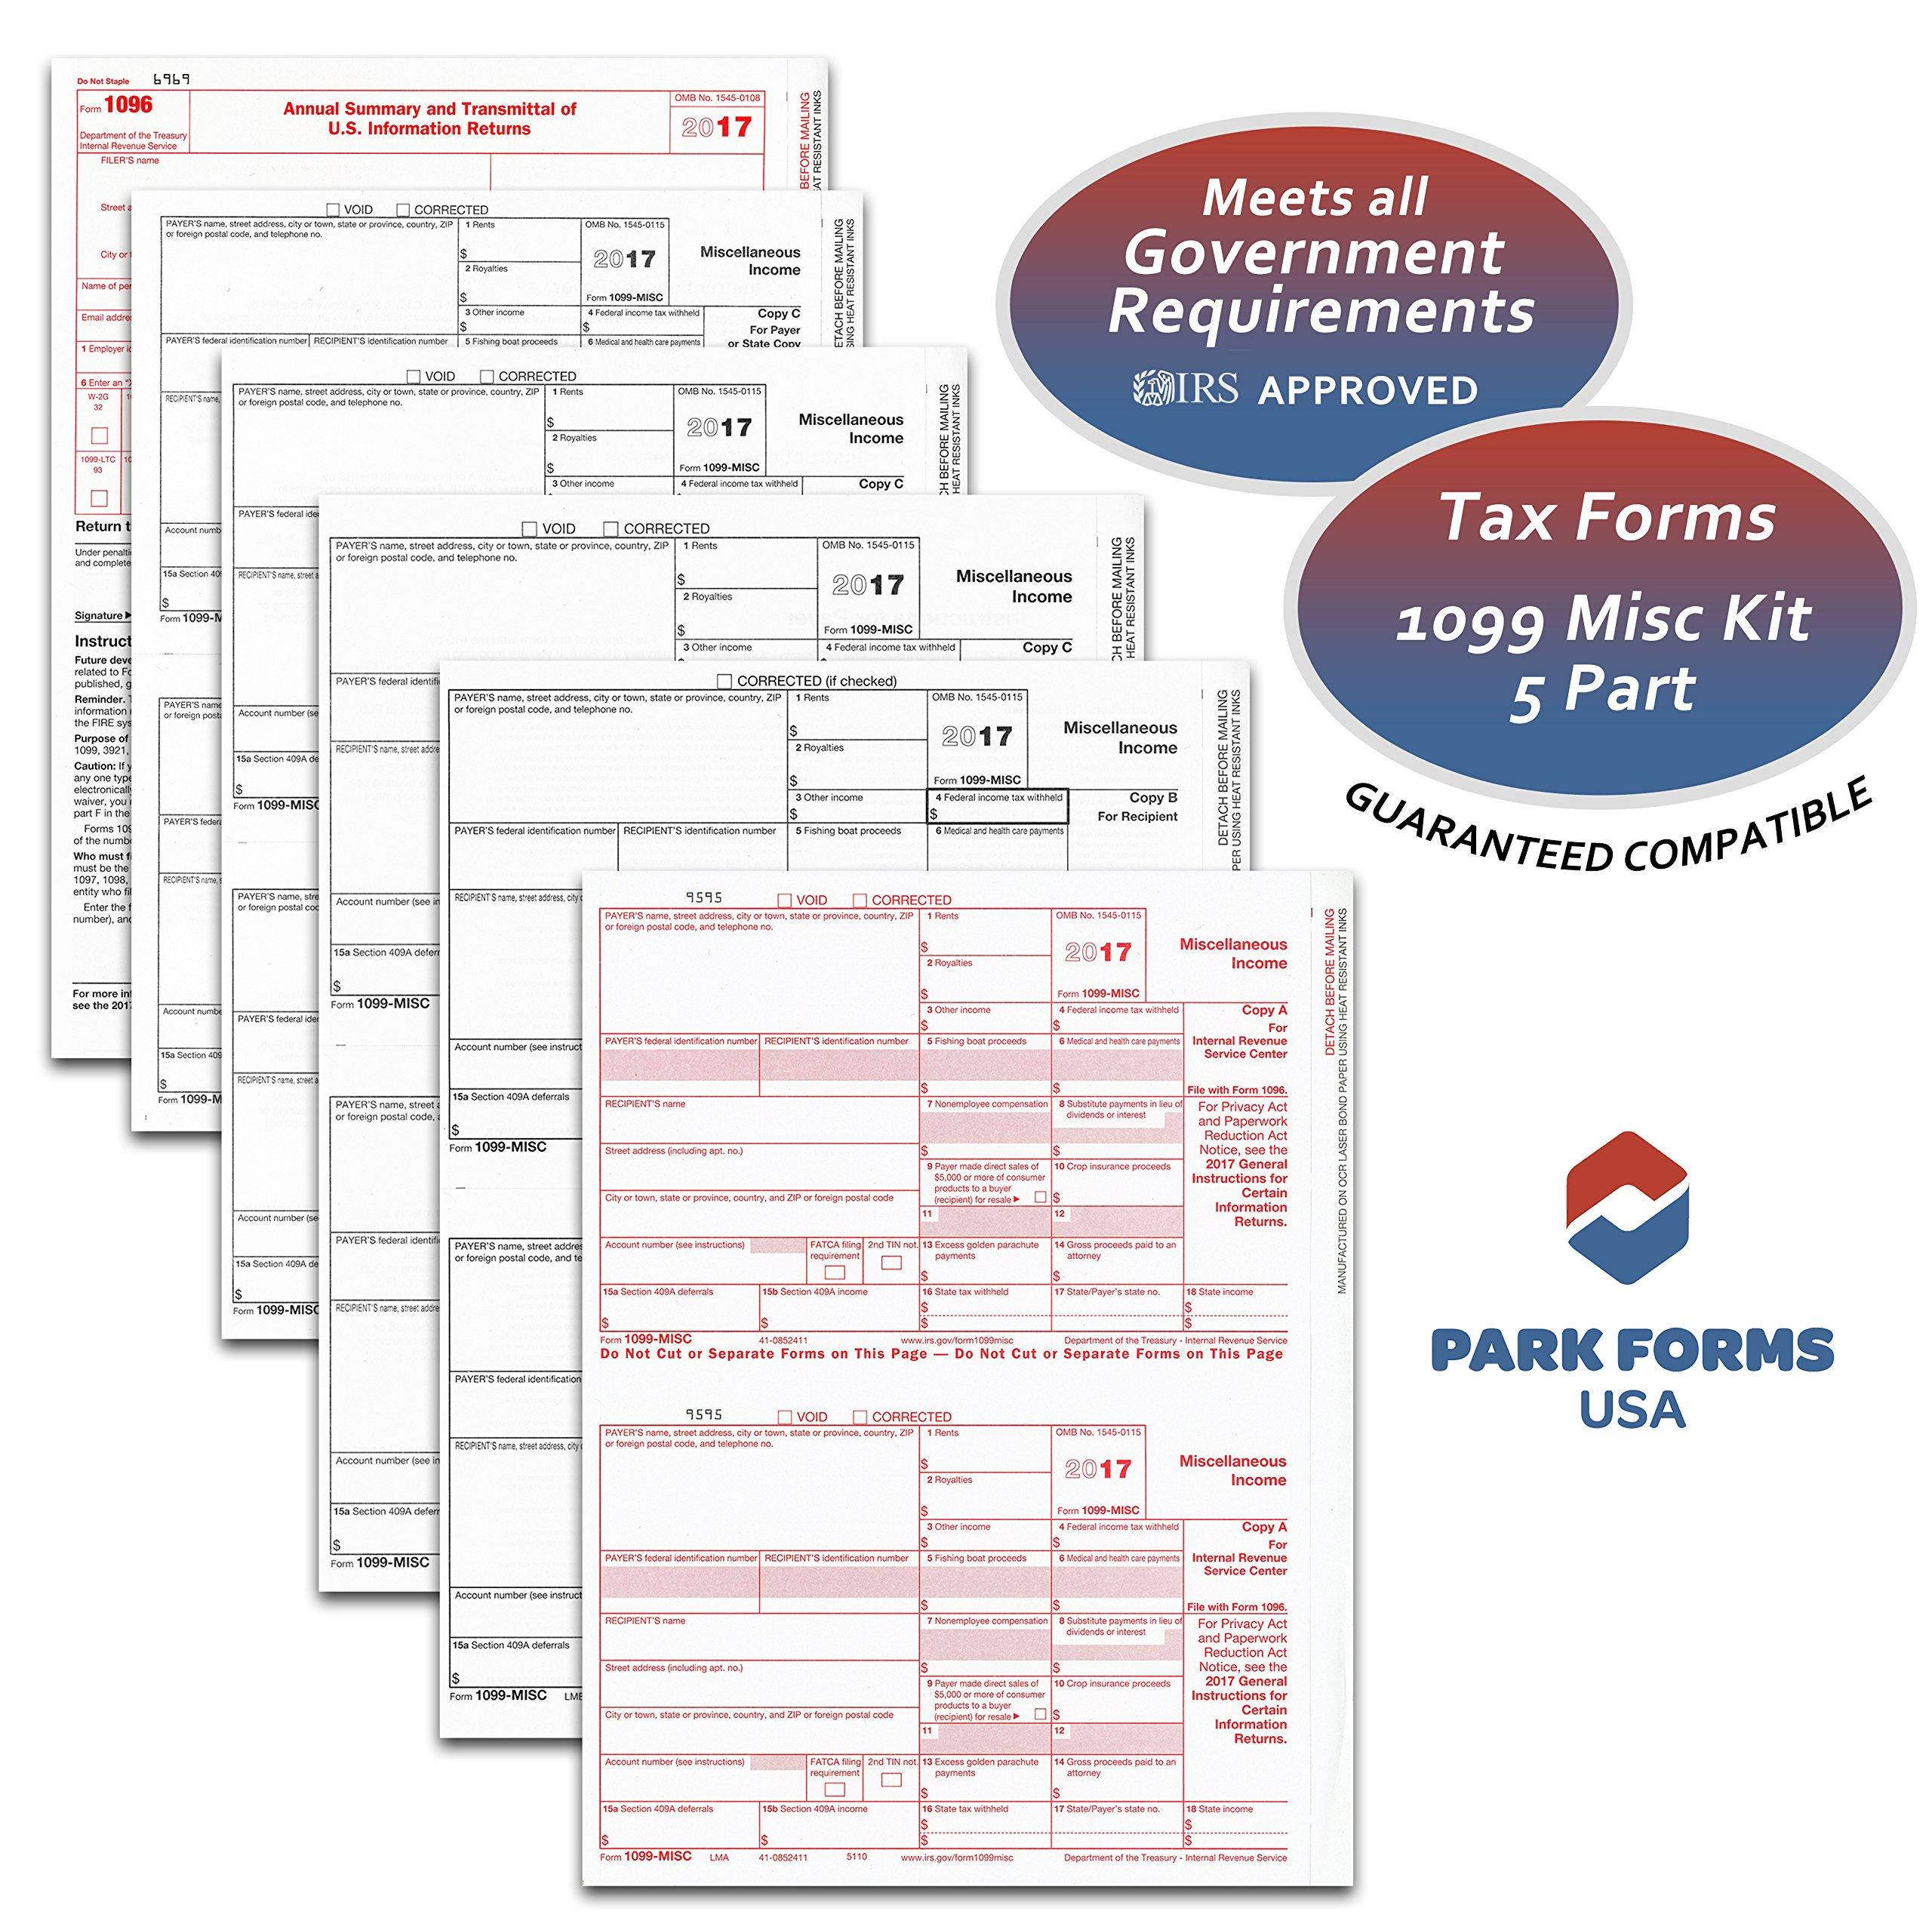 2018  Laser Tax Forms - 1099-MISC (5-Part Set) Income for 25 Vendors - Park Forms